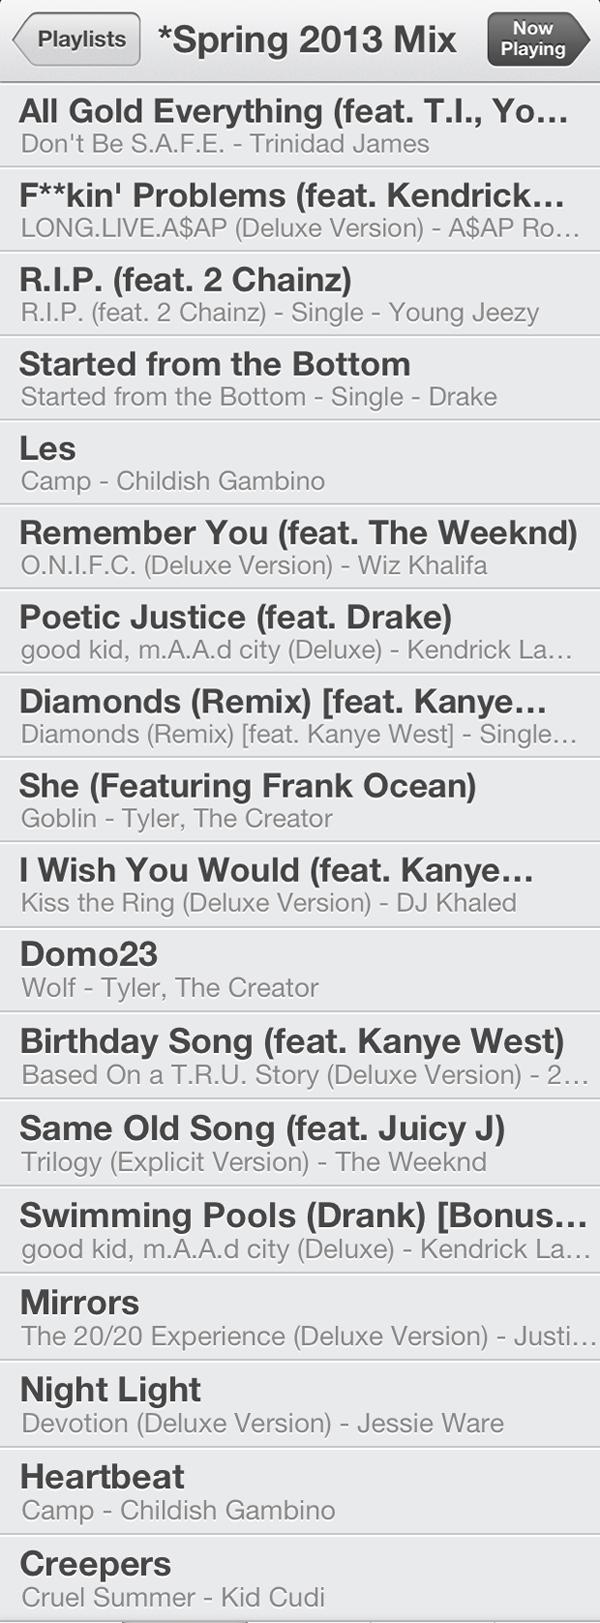 Spring Mix 2013 Playlist